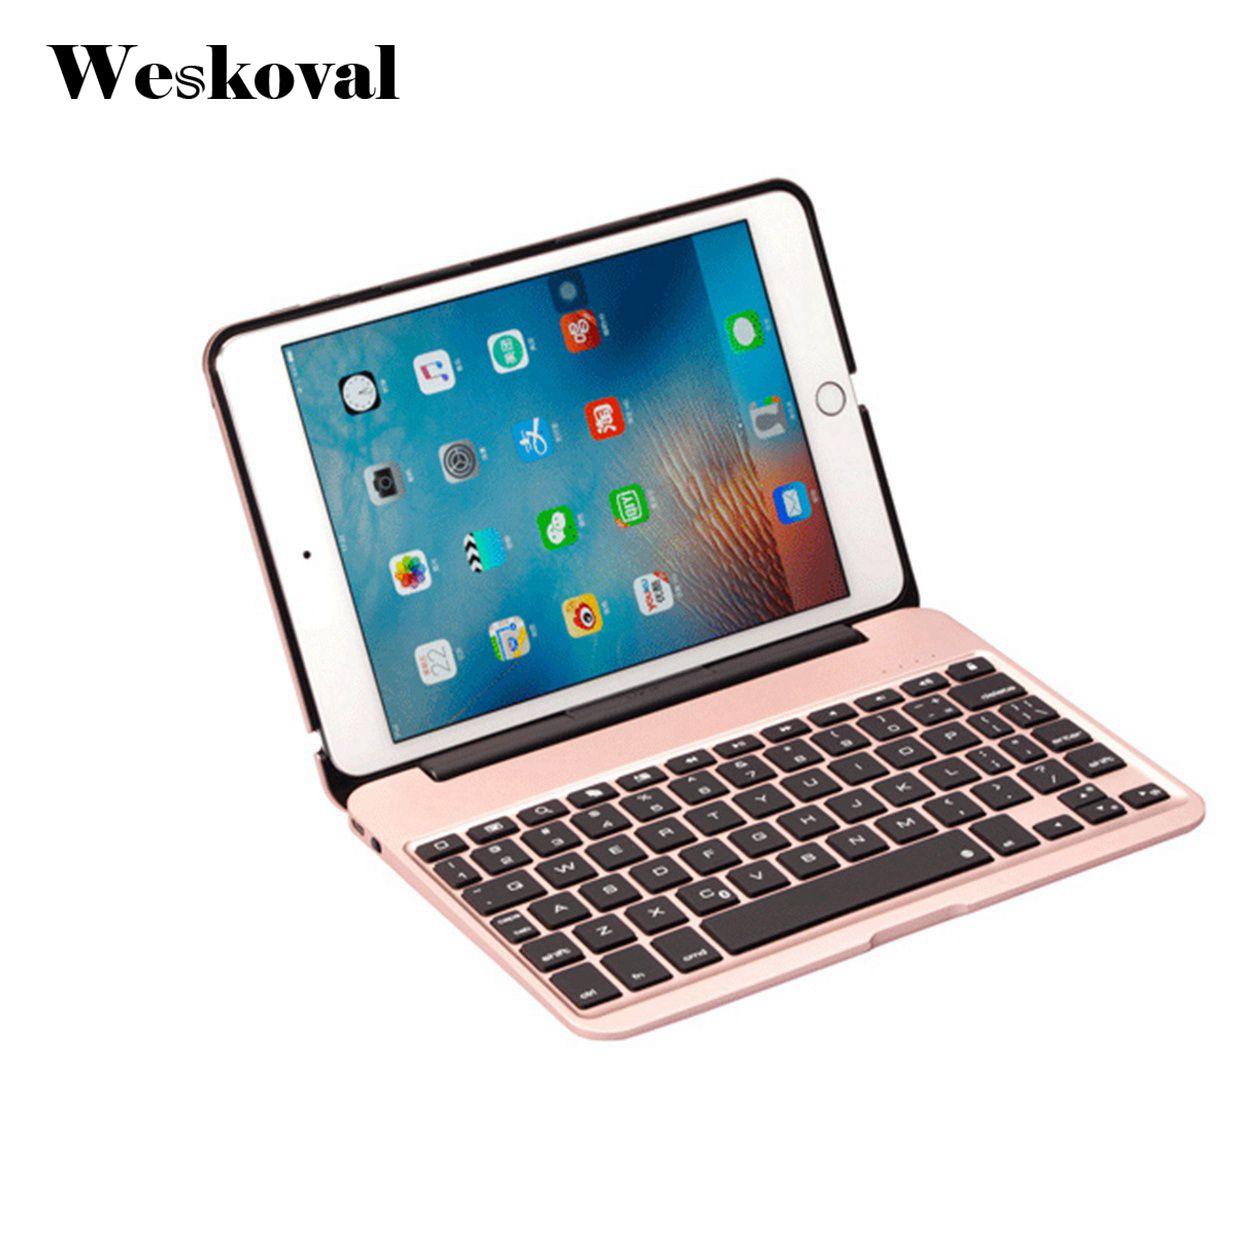 Für iPad Mini 4 Drahtlose Bluetooth Tastatur-kasten Für iPad Mini 4 7,9 zoll Tablet Aluminiumlegierung Standplatz-abdeckung Flip Capa + Stylus